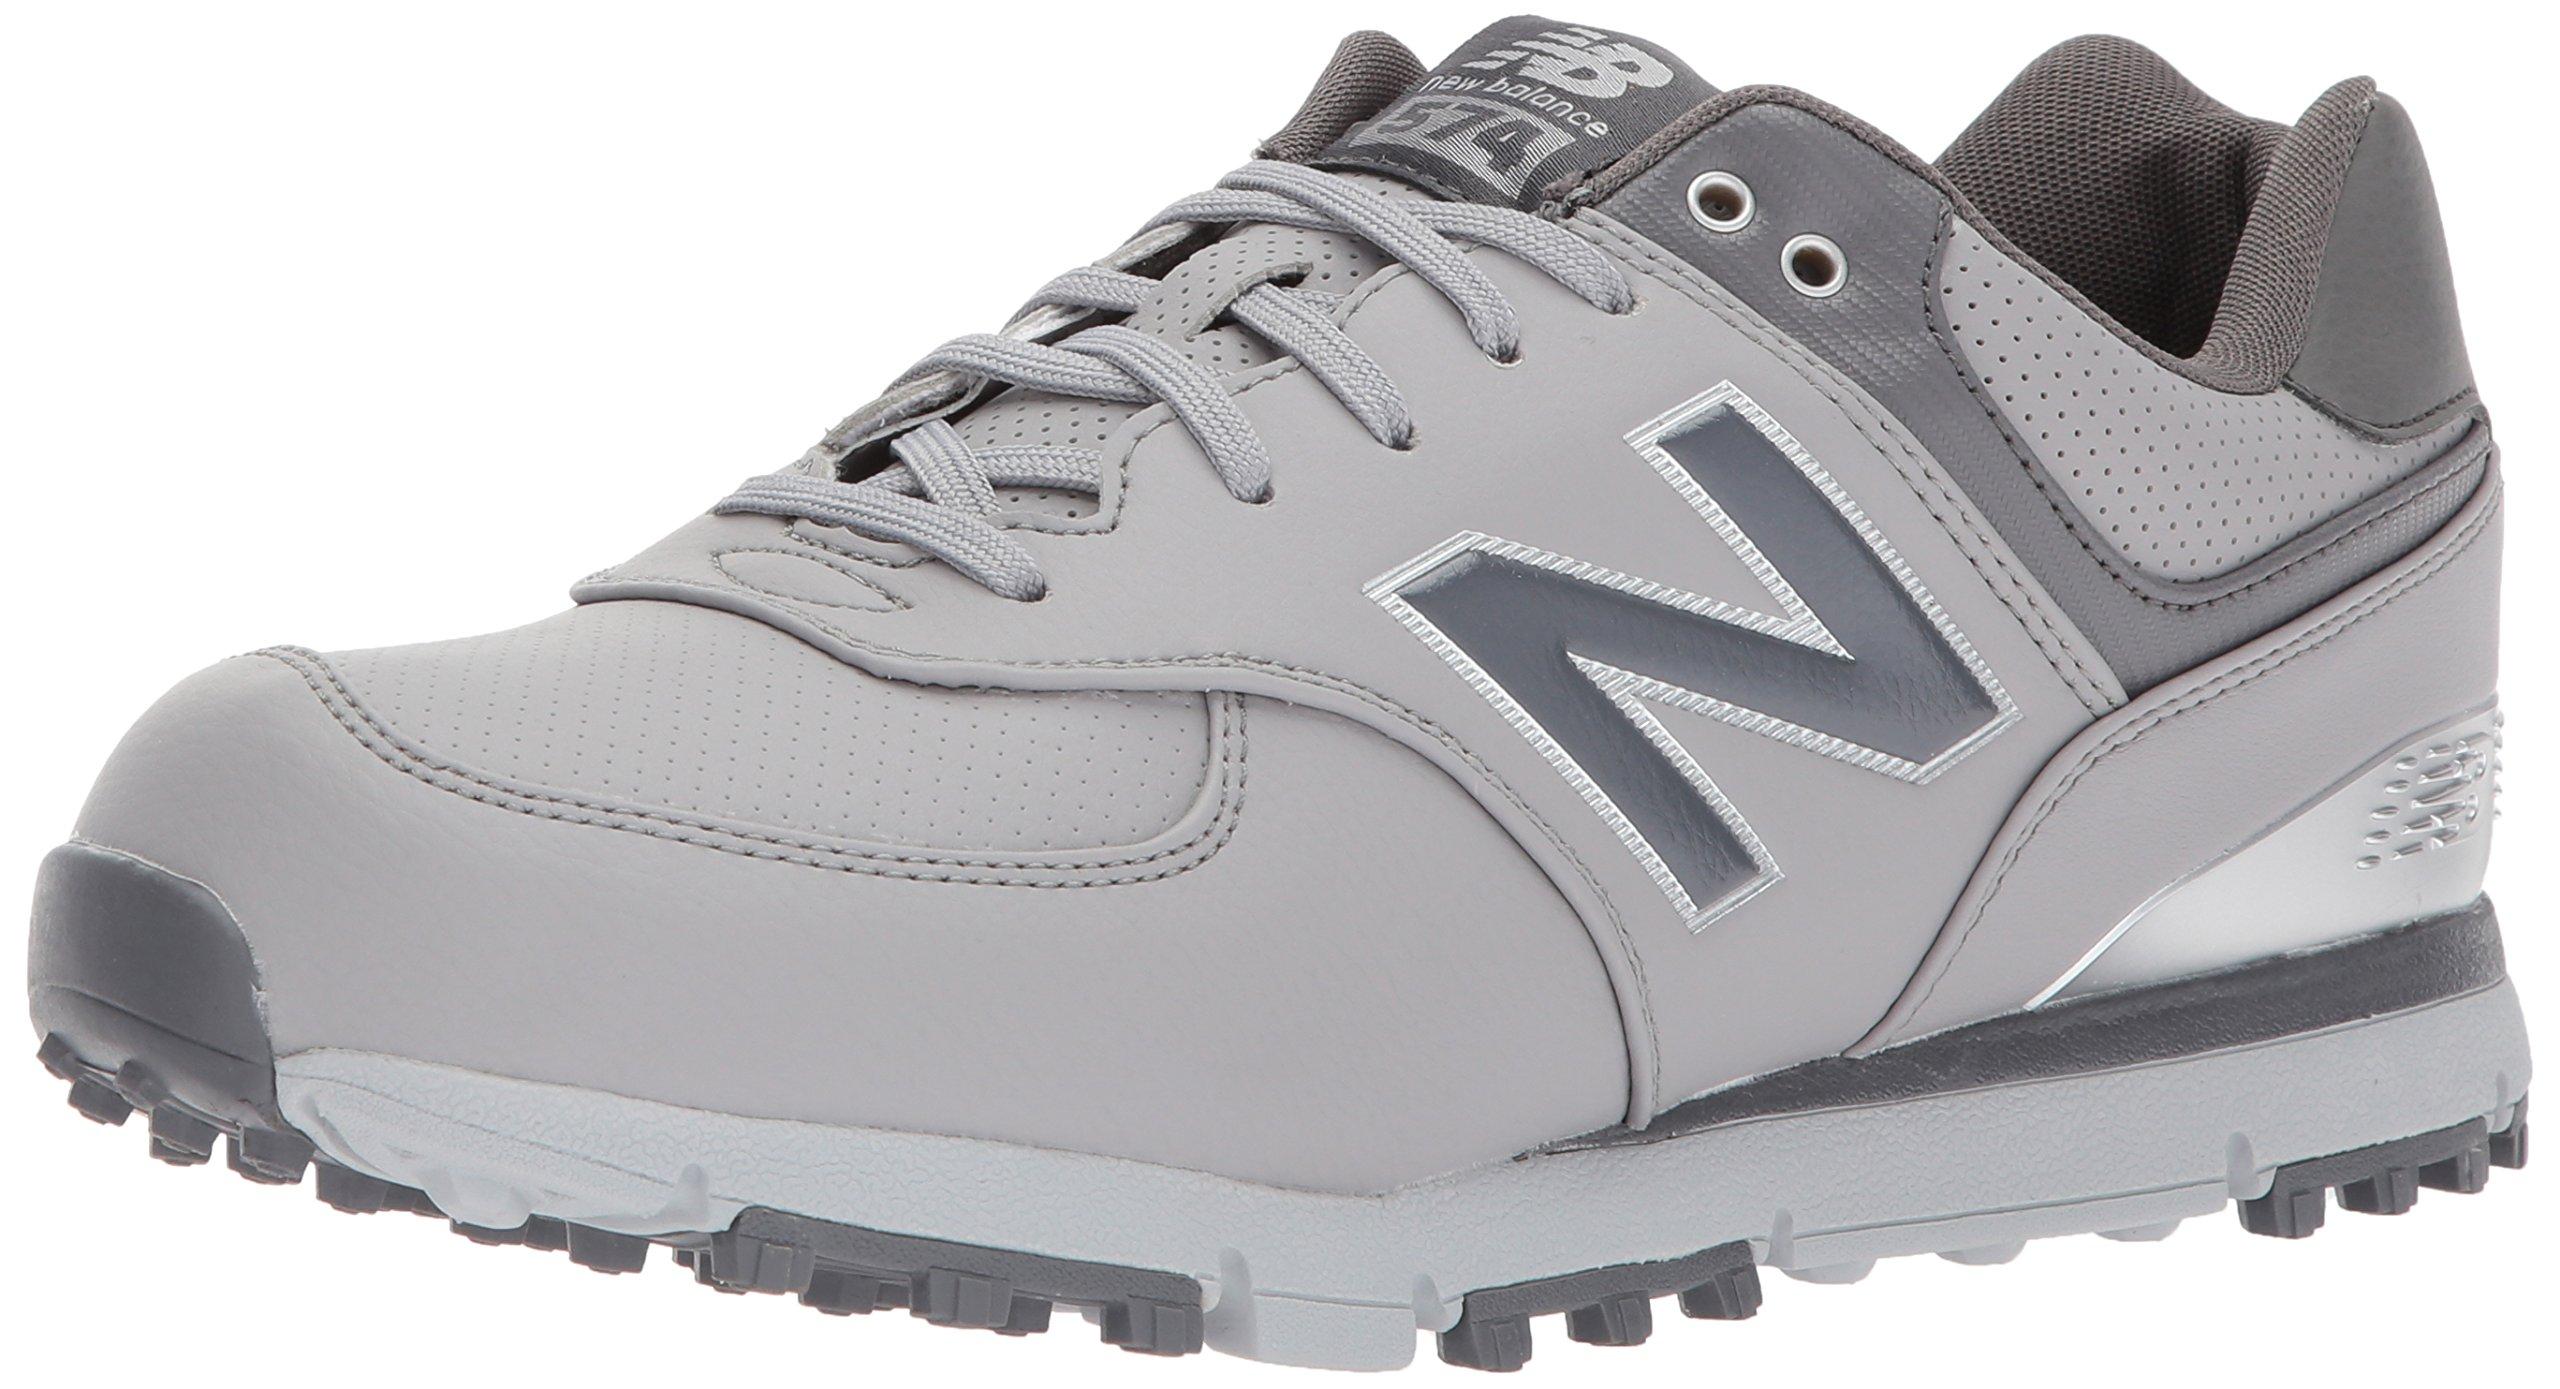 New Balance Men's 574 SL Golf Shoe, Grey/Silver, 10.5 2E 2E US by New Balance